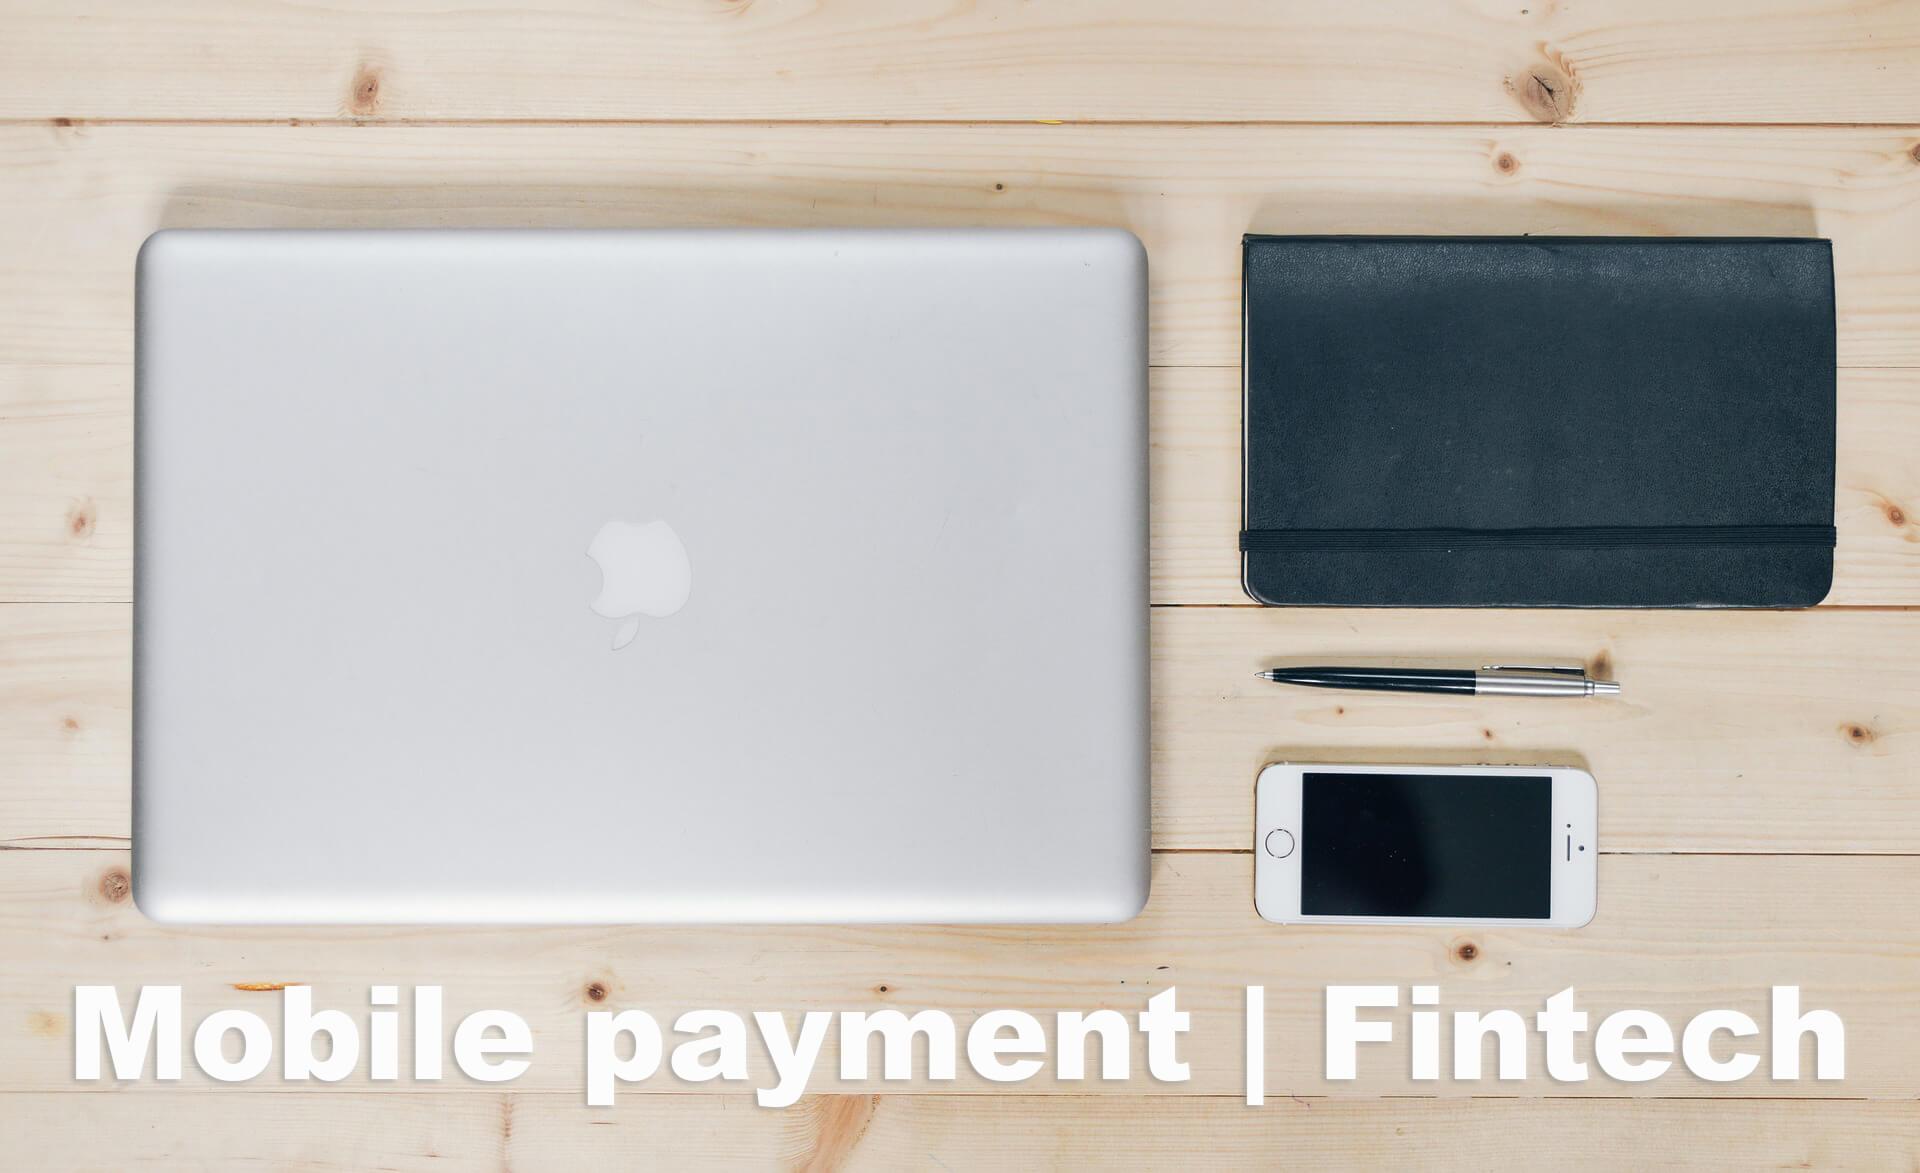 Mobile paymetn_Fintech (1)